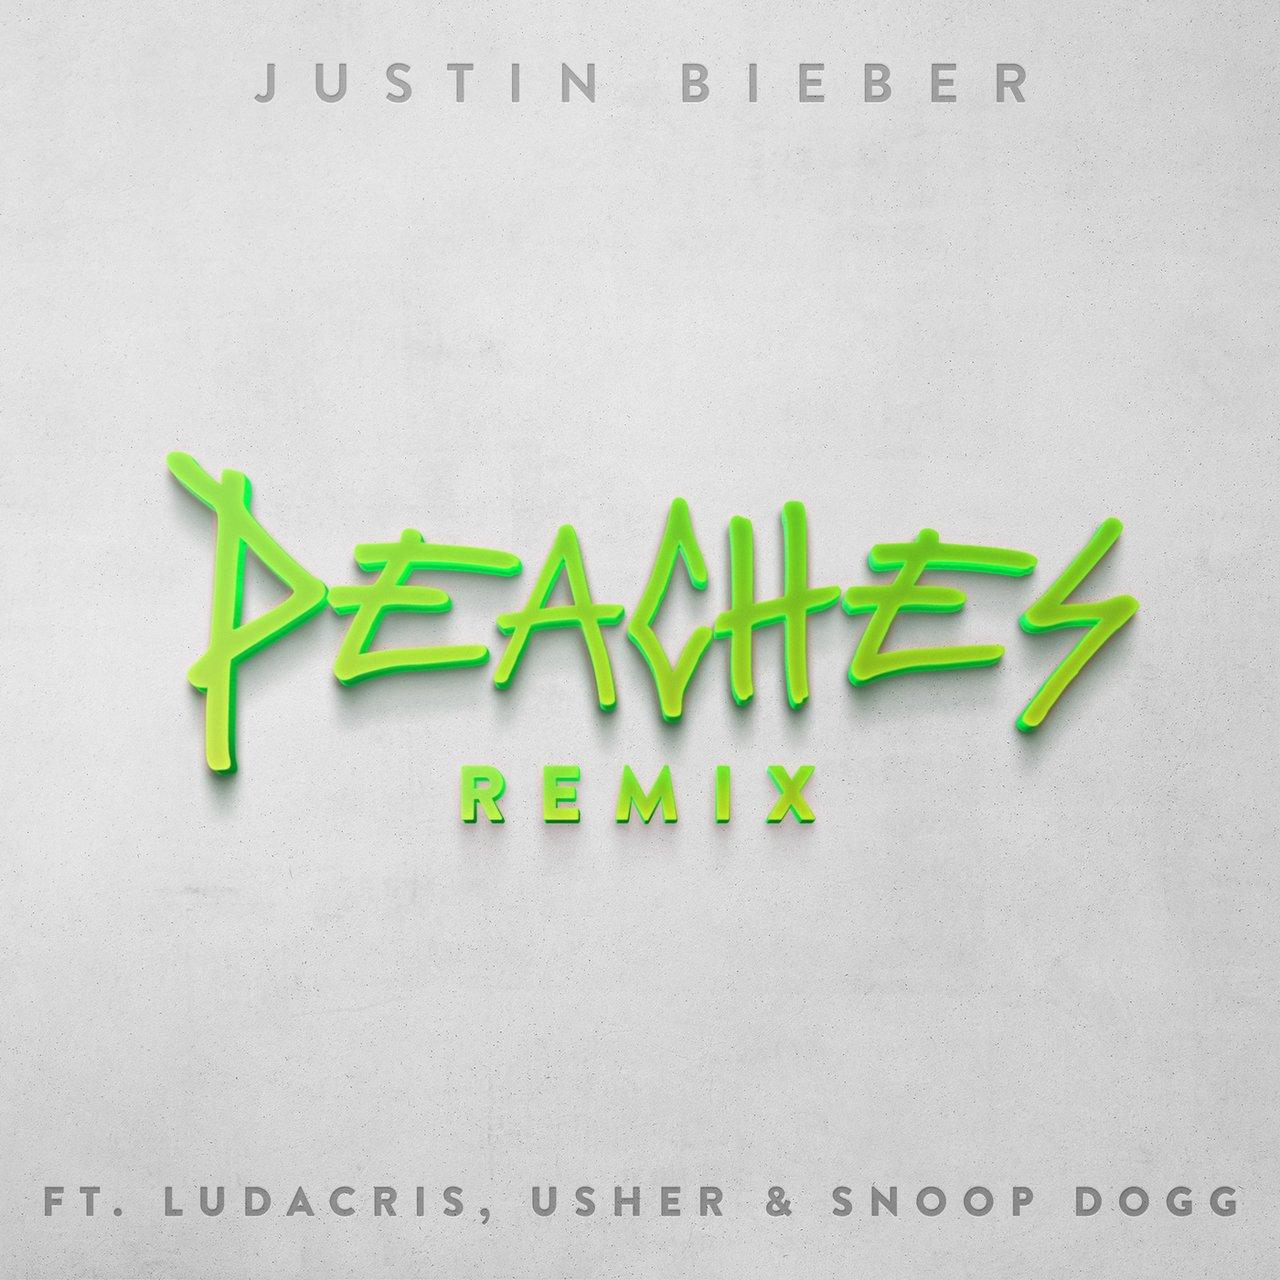 Justin Bieber, Ludacris, Usher Snoop Dogg 'Peaches Remix' Song